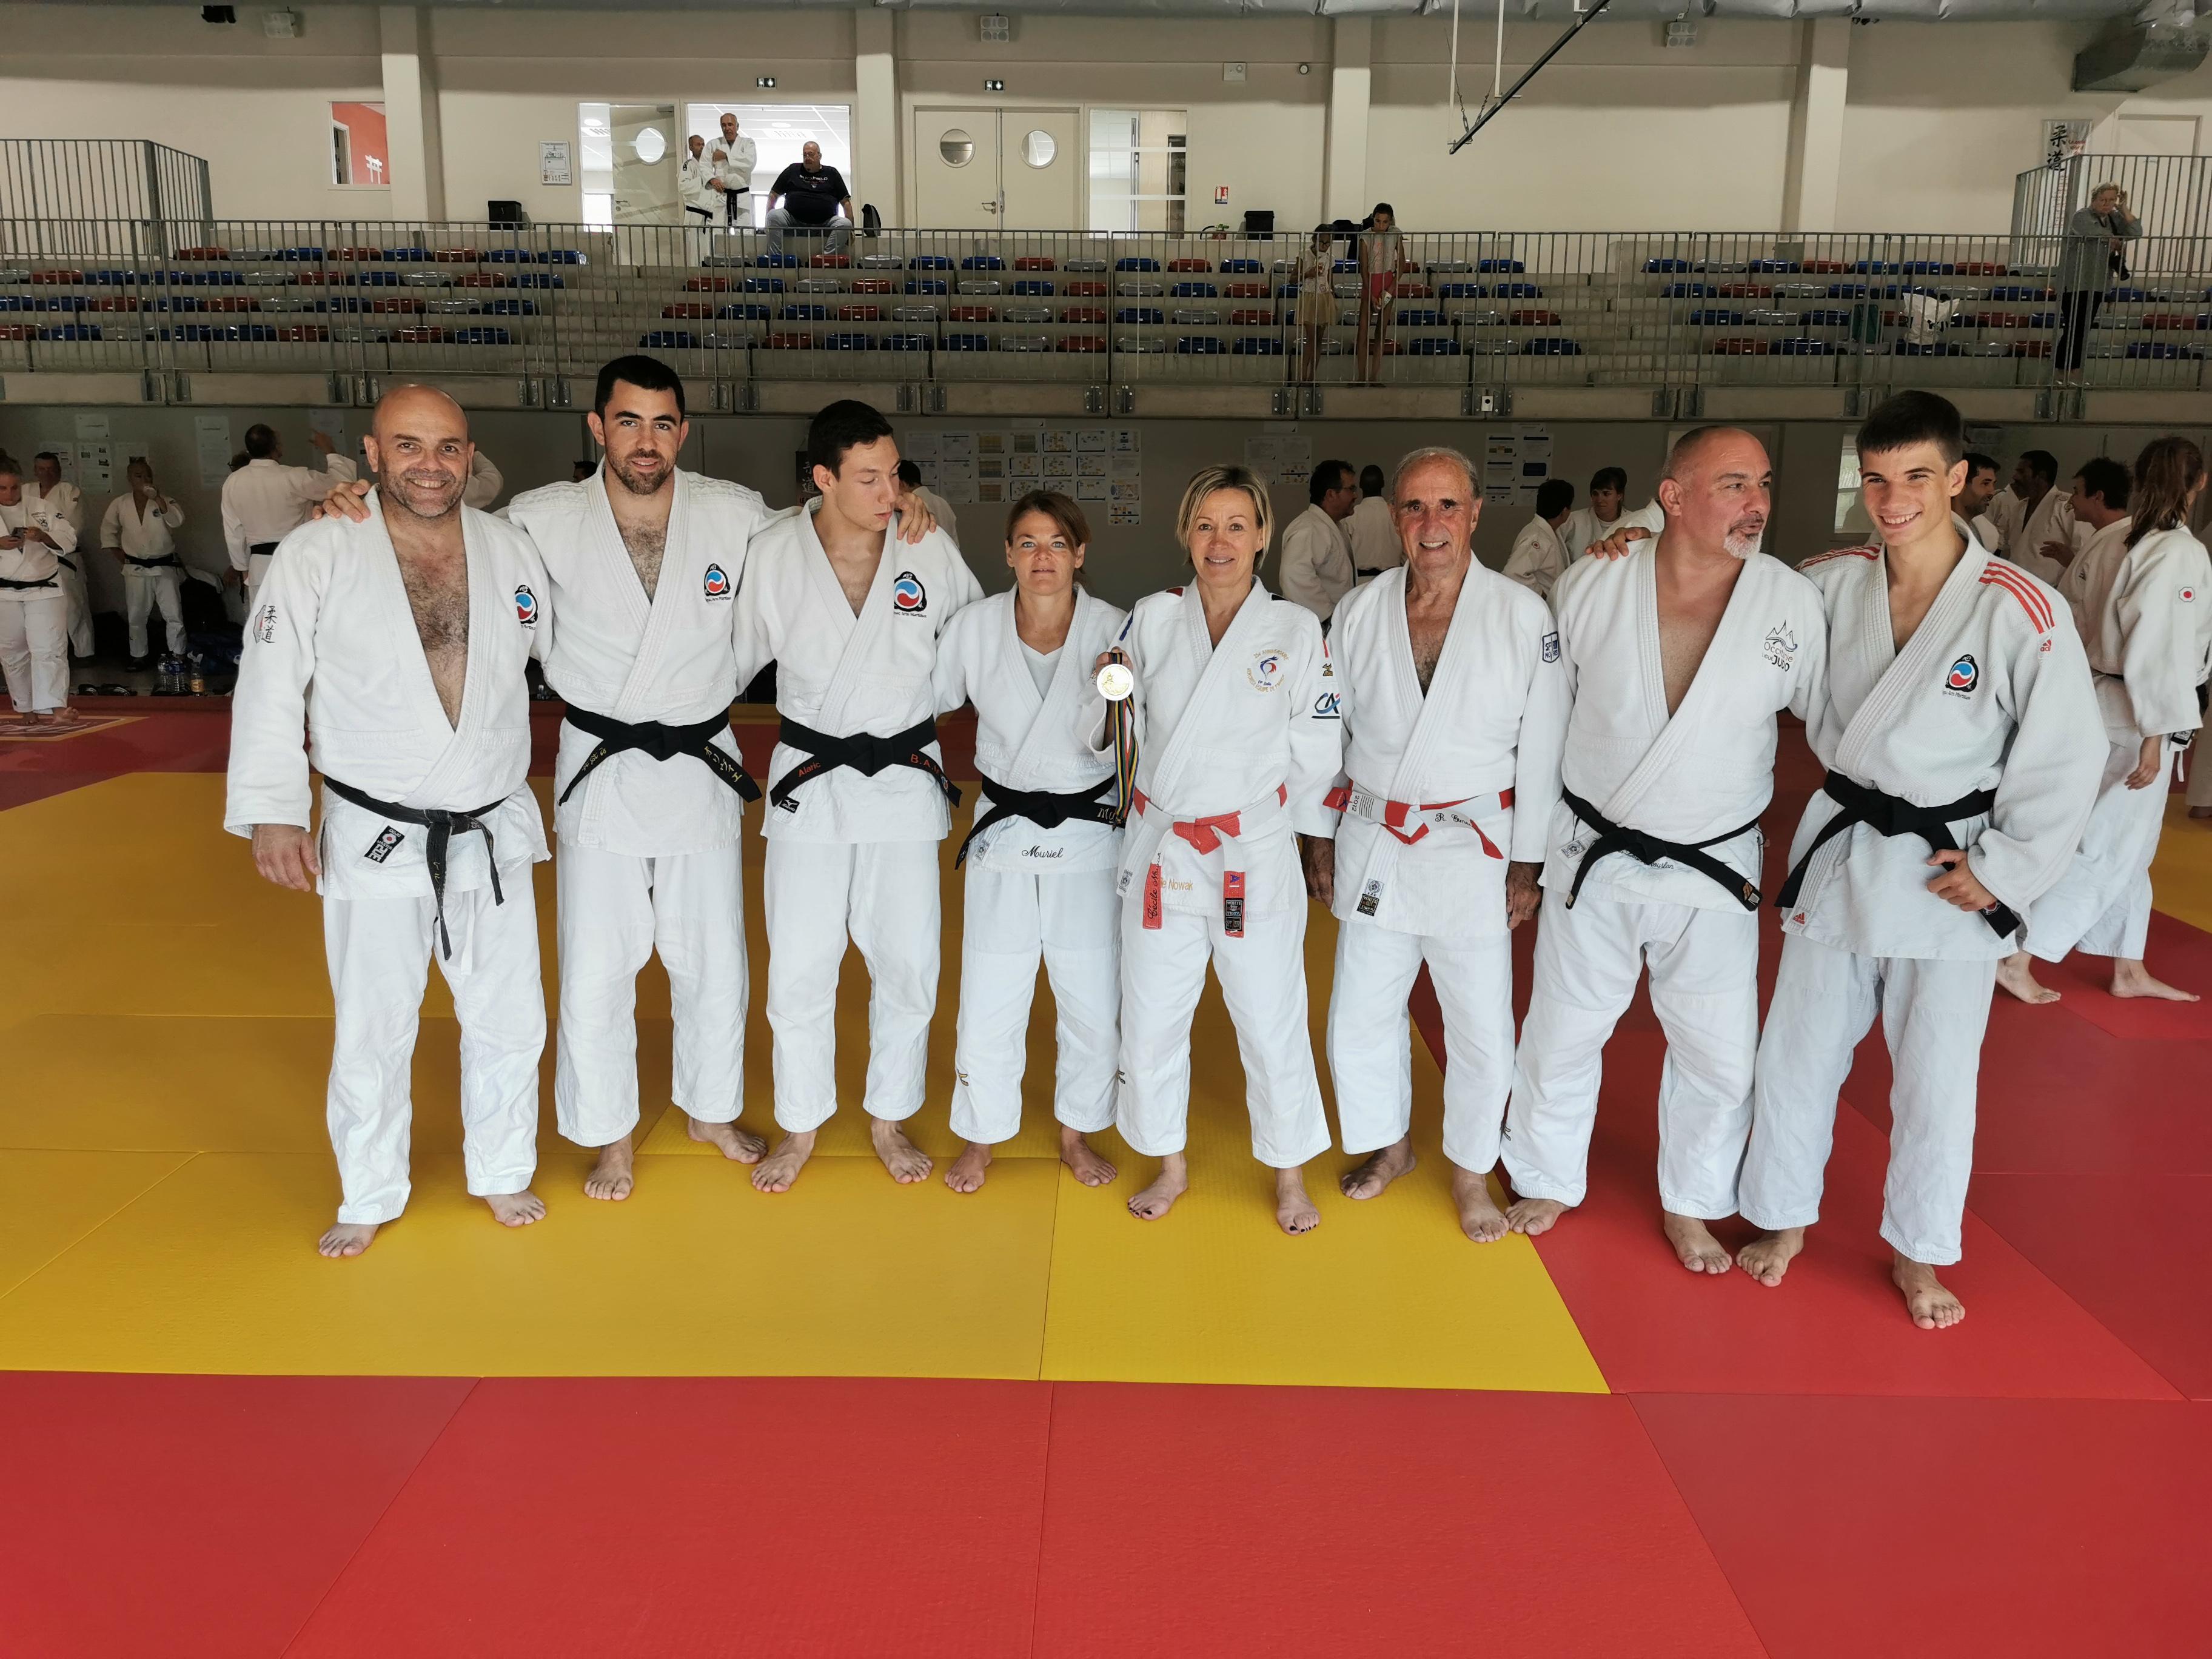 Calendrier Judo Occitanie.Stage Rentree Enseignants Blagnac Arts Martiaux